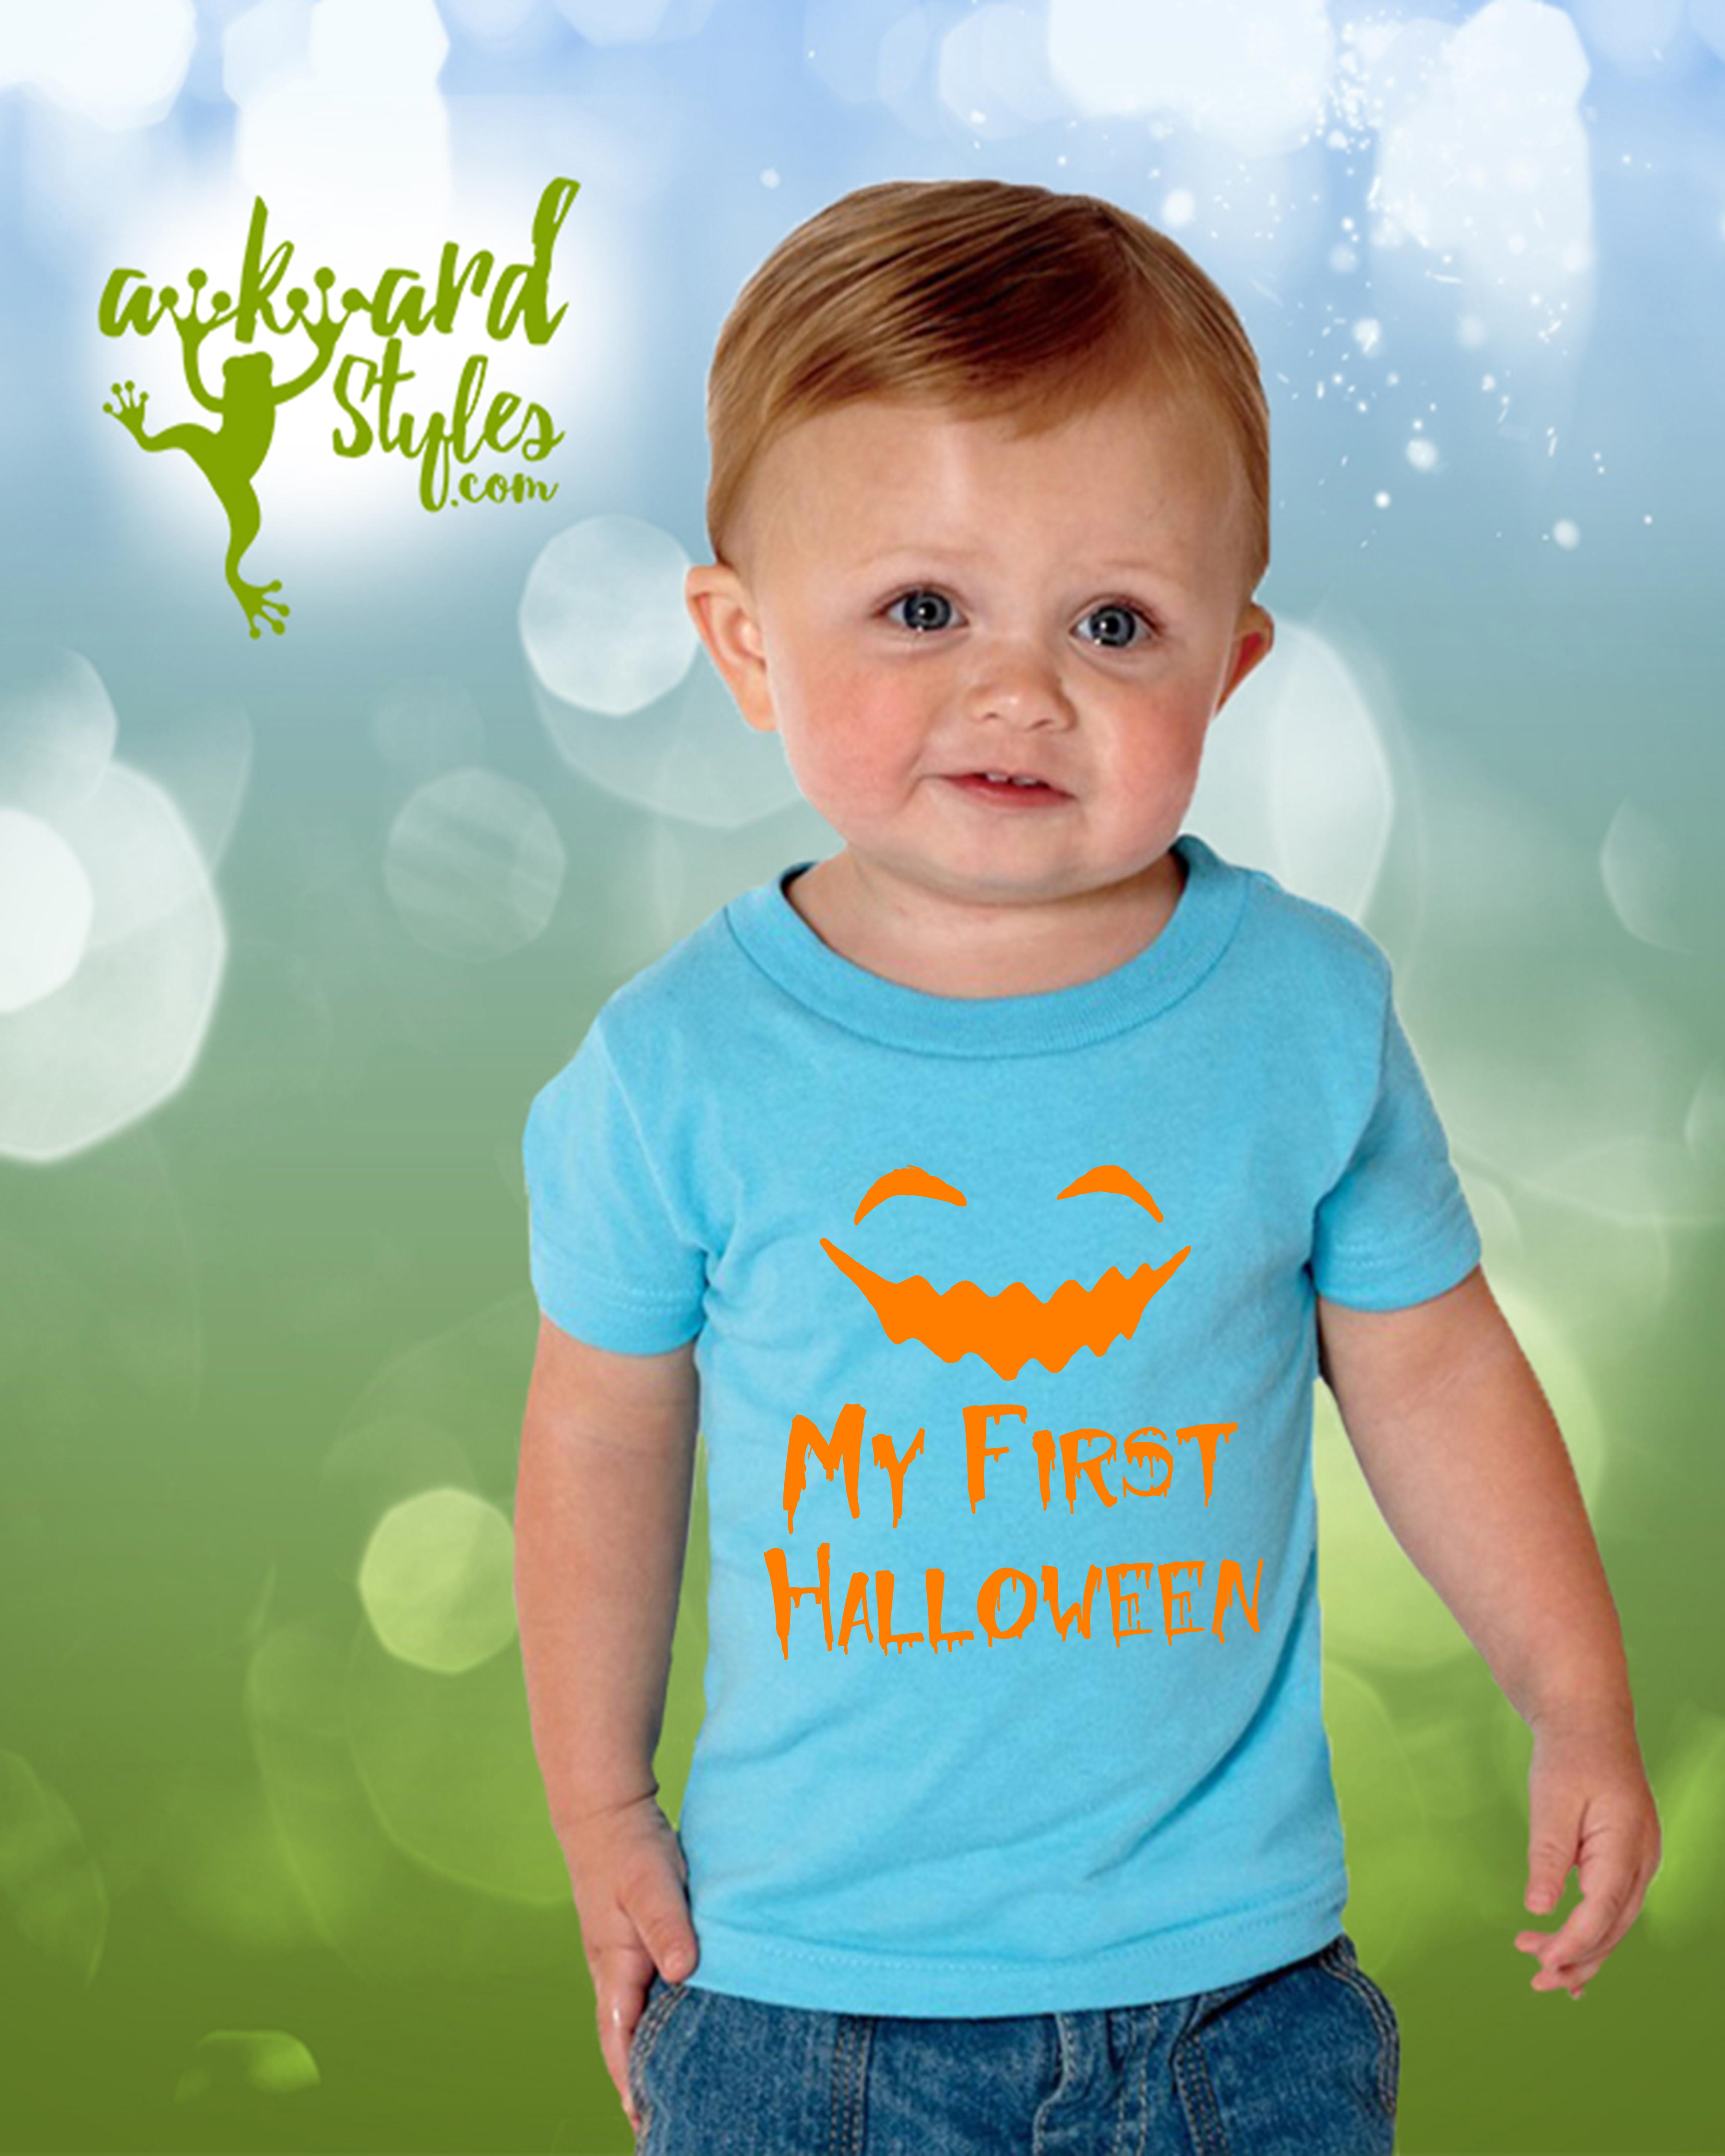 my first halloween toddler shirts girl boy infant shirts halloween